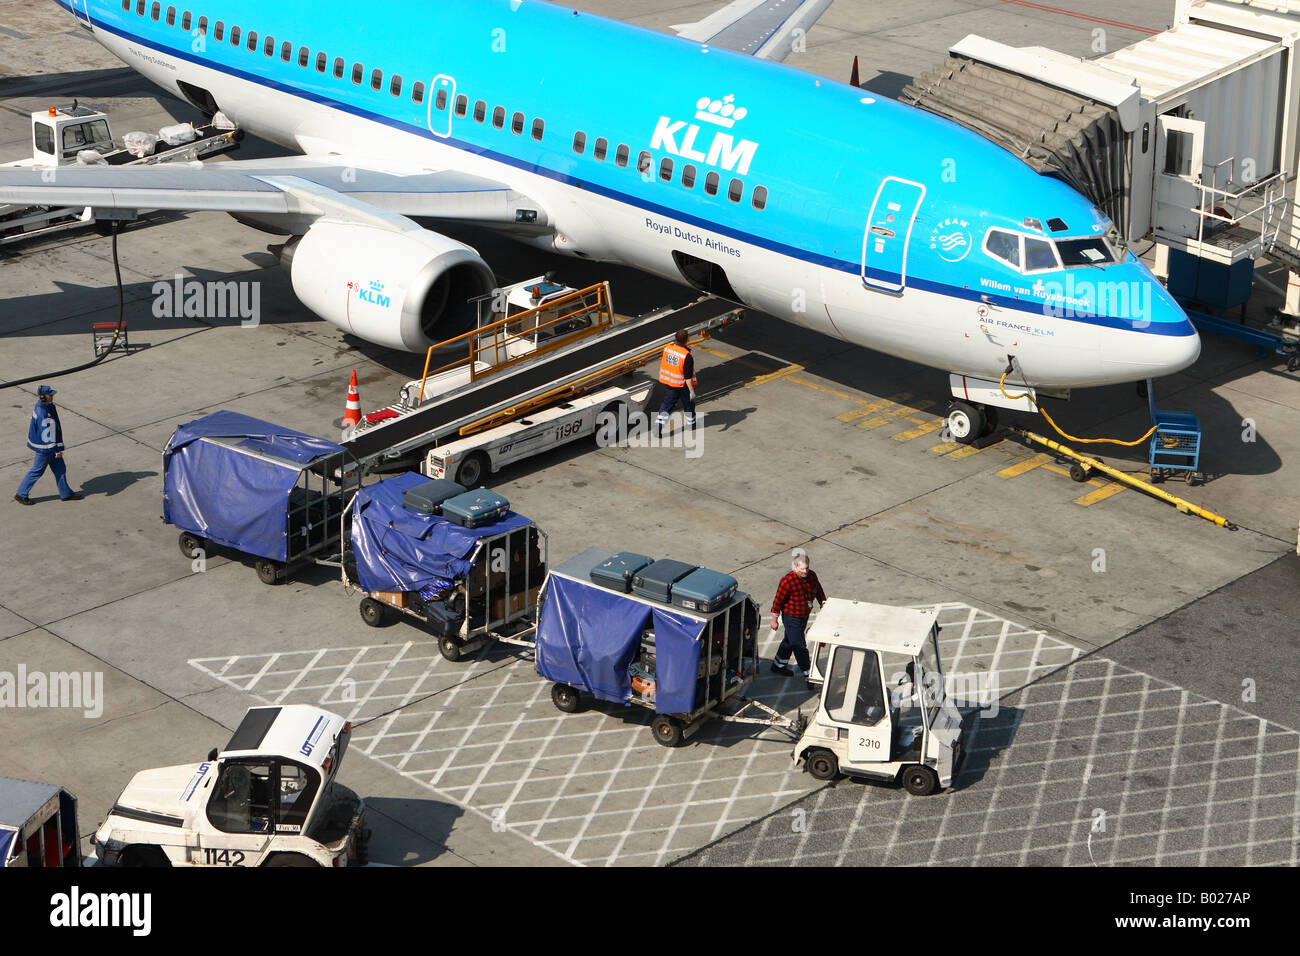 klm royal dutch airline case Find great deals on ebay for klm royal dutch airlines and klm sticker shop with confidence.